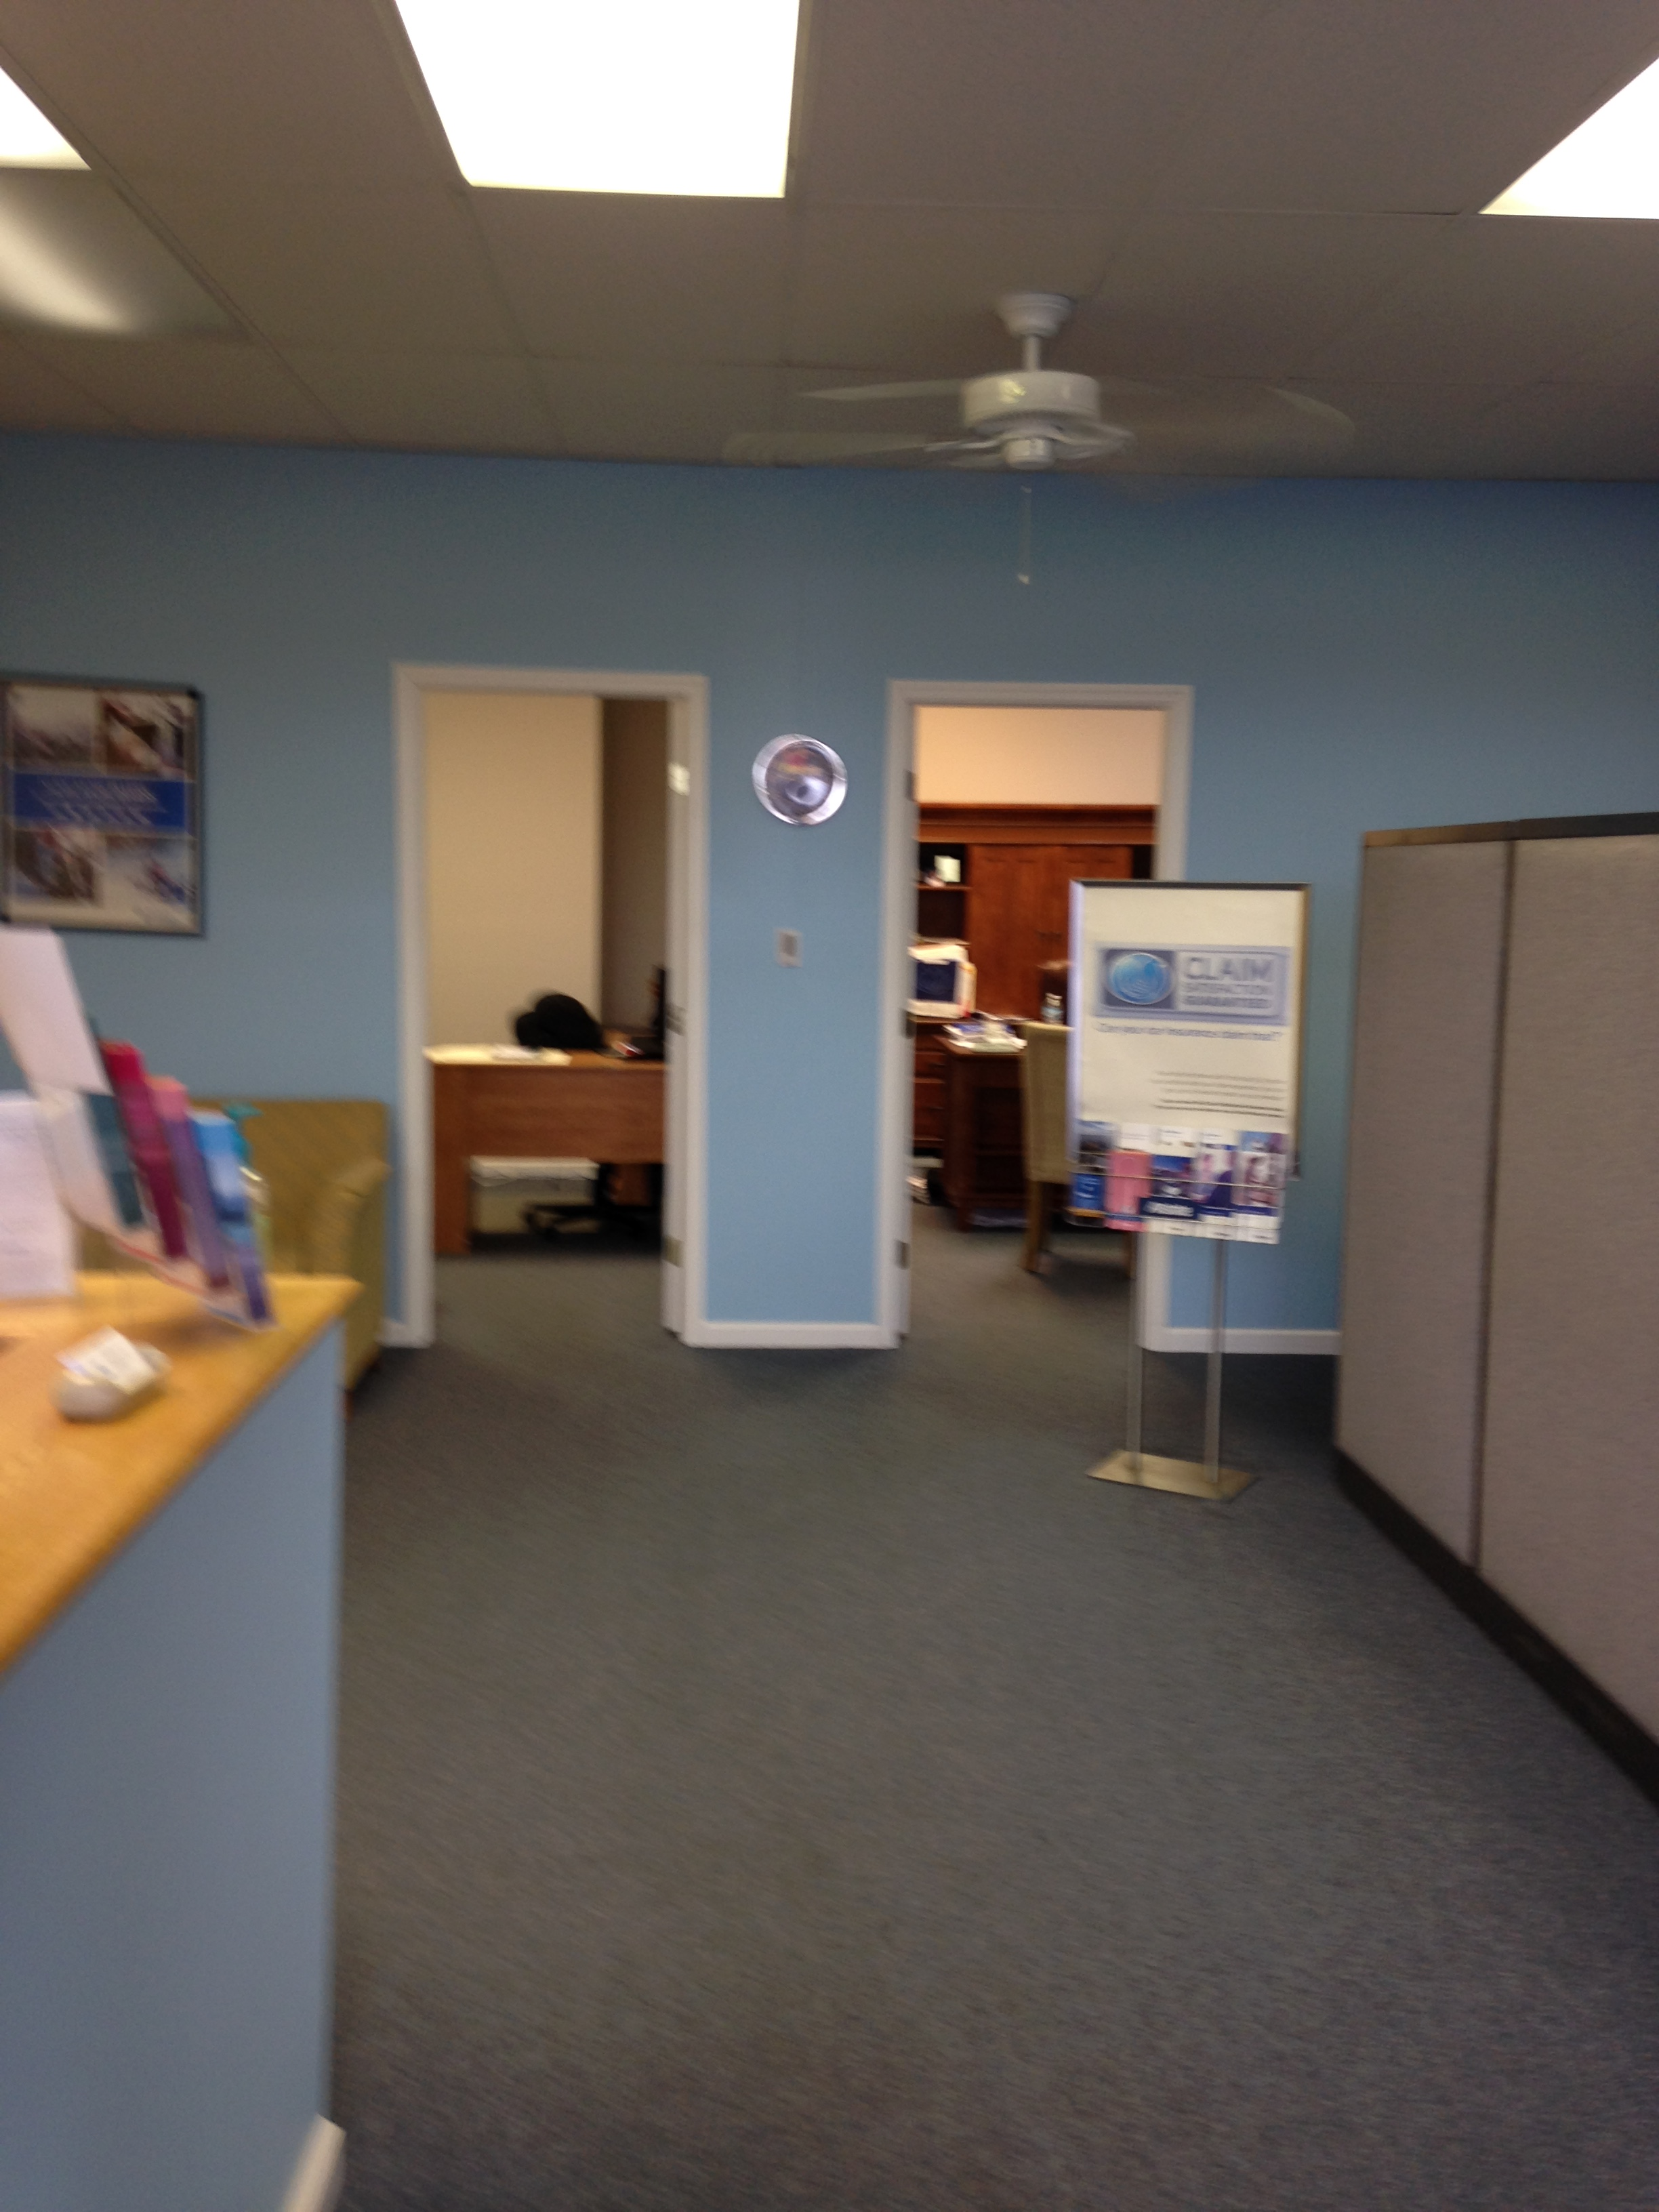 Car Insurance Springboro